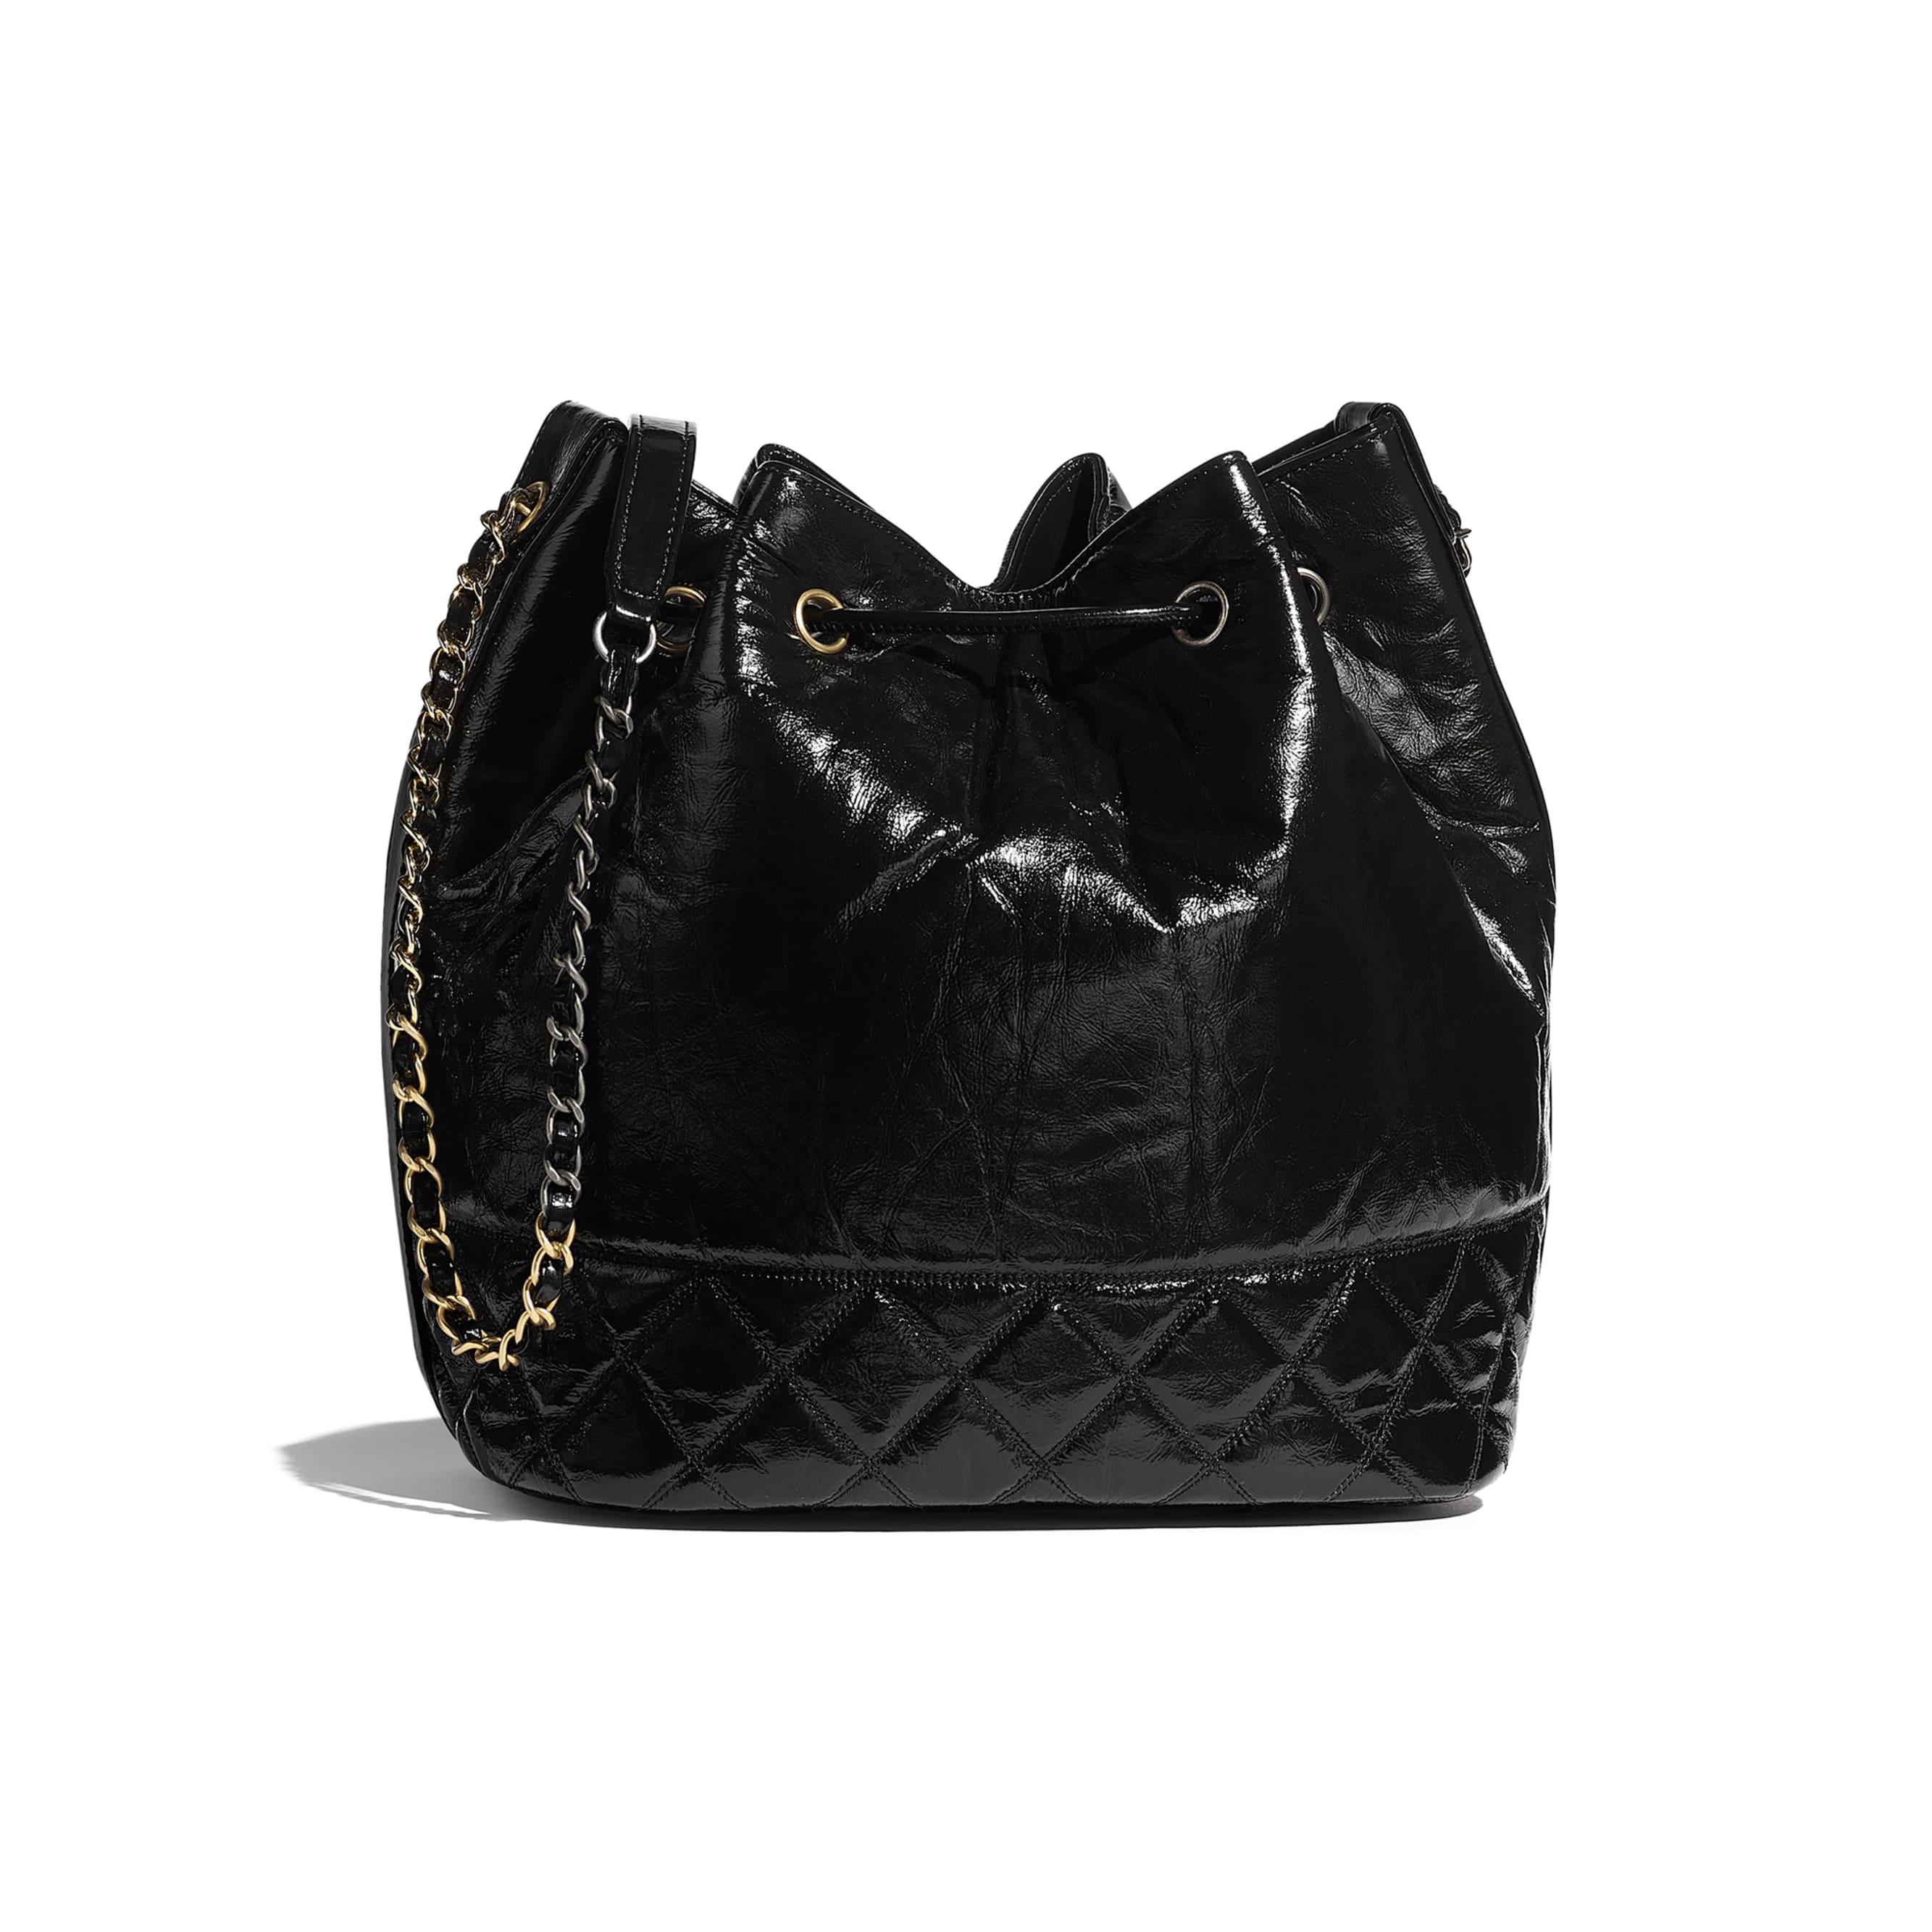 Large Drawstring Bag - Black - Shiny Aged Calfskin, Gold-Tone, Silver-Tone & Ruthenium-Finish Metal - CHANEL - Alternative view - see standard sized version